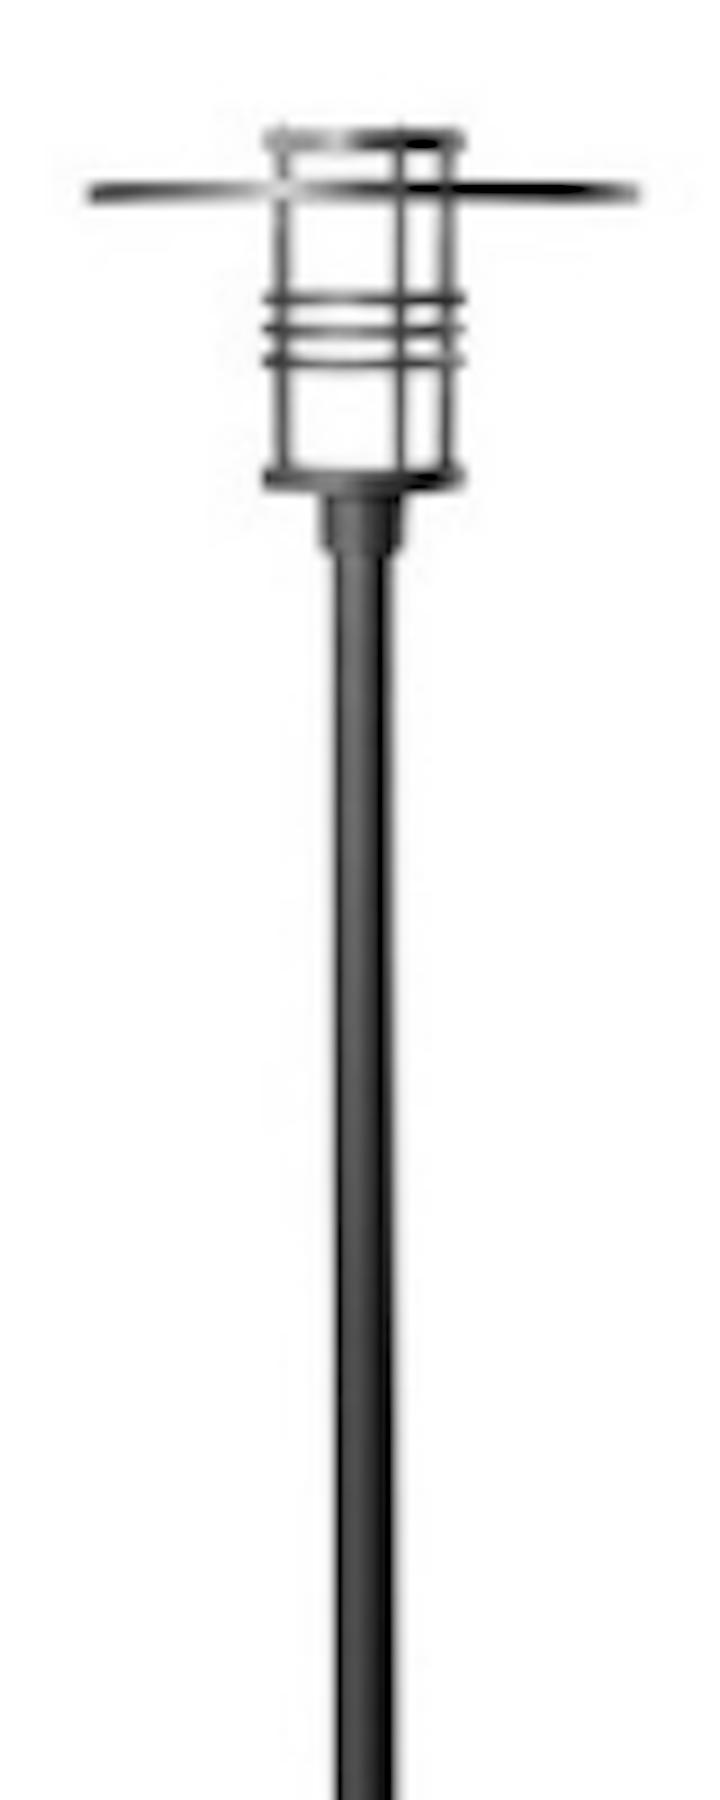 Content Dam Leds En Ugc 2013 08 Hessamerica Upgrades Avalon Led Light Engine Leftcolumn Article Thumbnailimage File